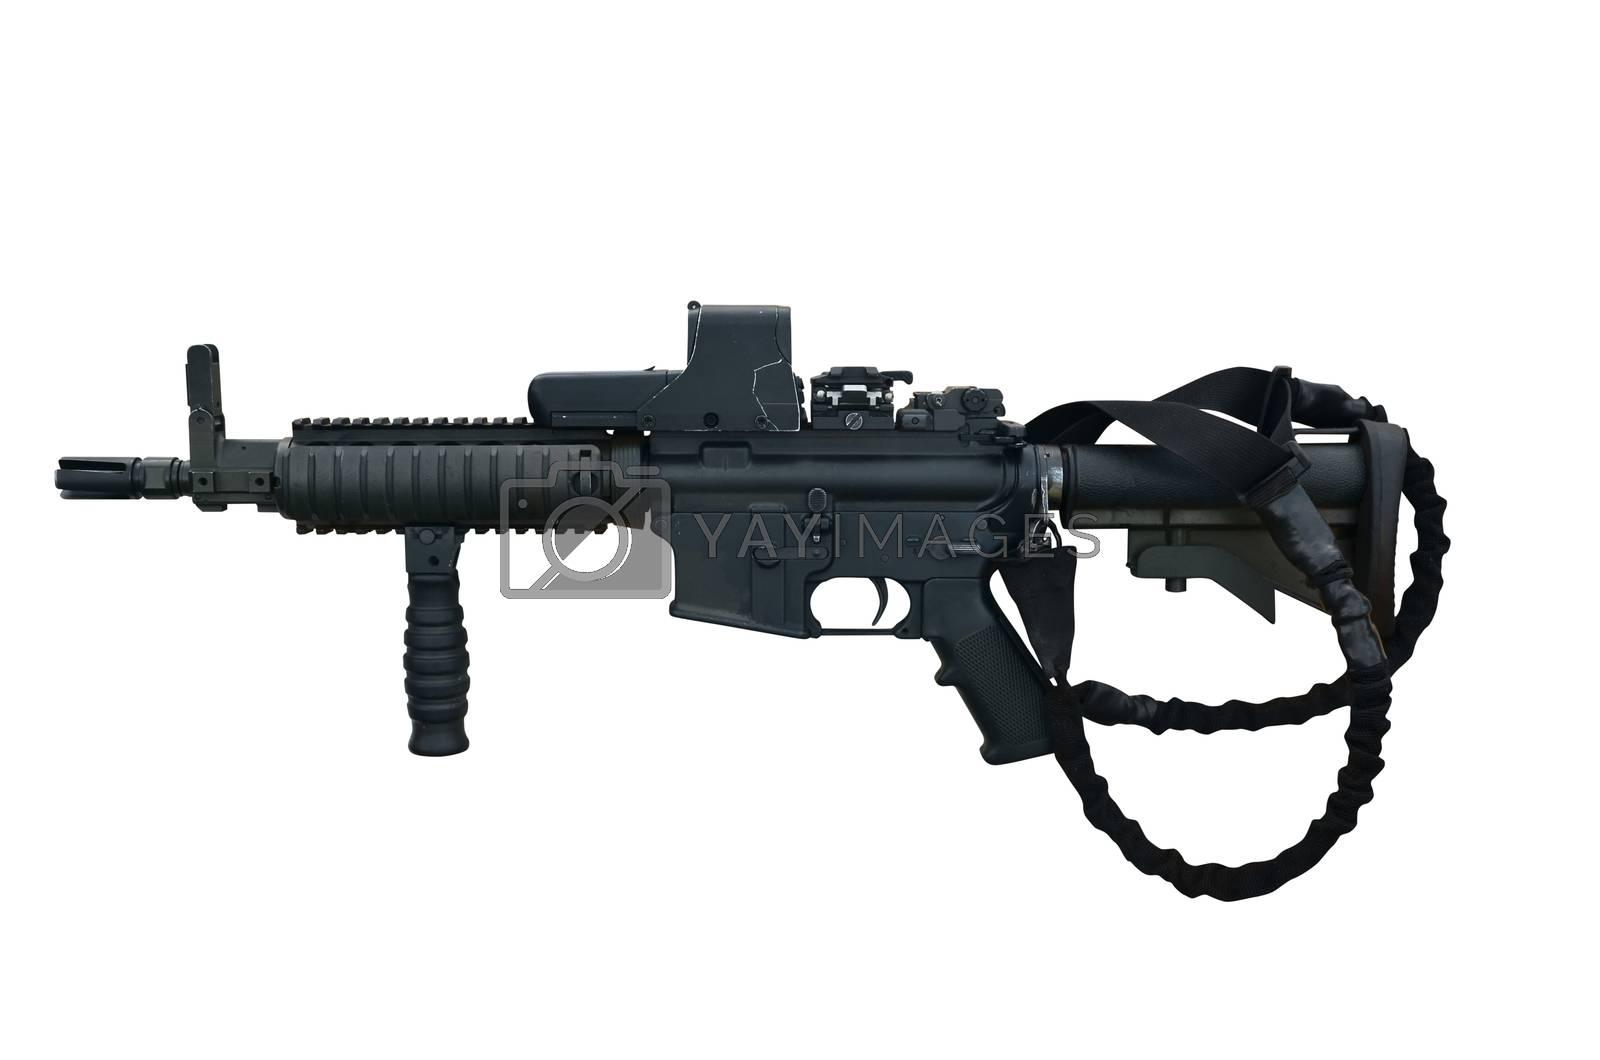 Royalty free image of Machine gun C8 CQB by Vectorex